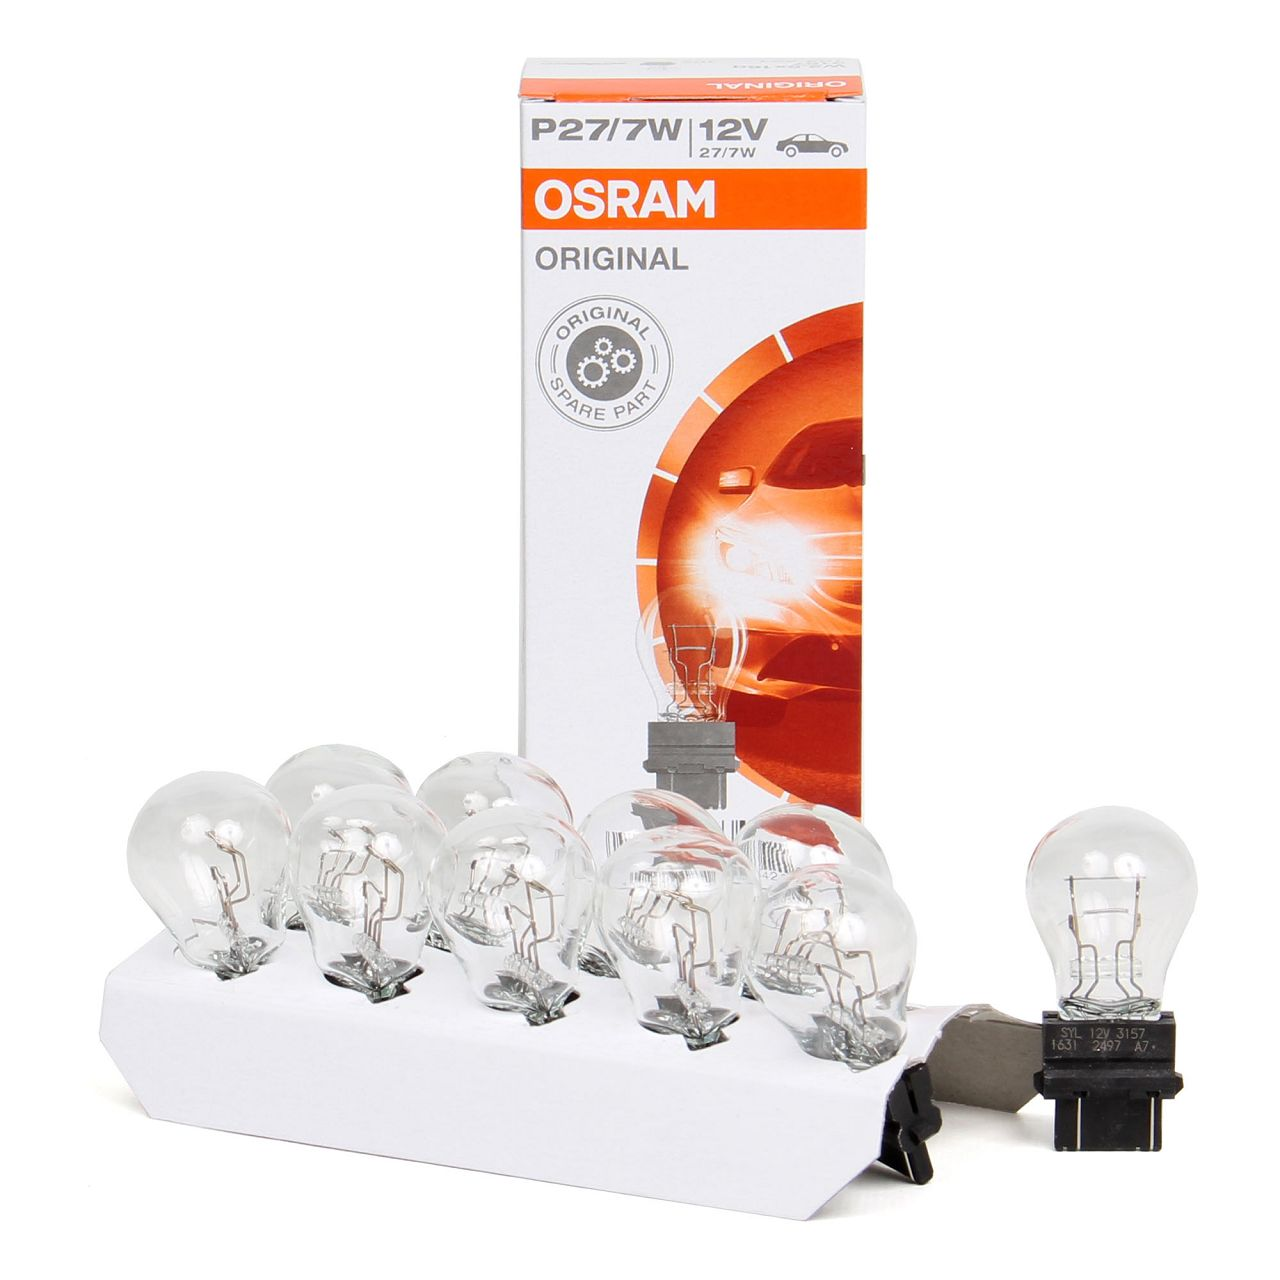 10x OSRAM Glühlampe Sockelglühlampe ORIGINAL-Line P27/7W 12V 27/7W W2,5x16q